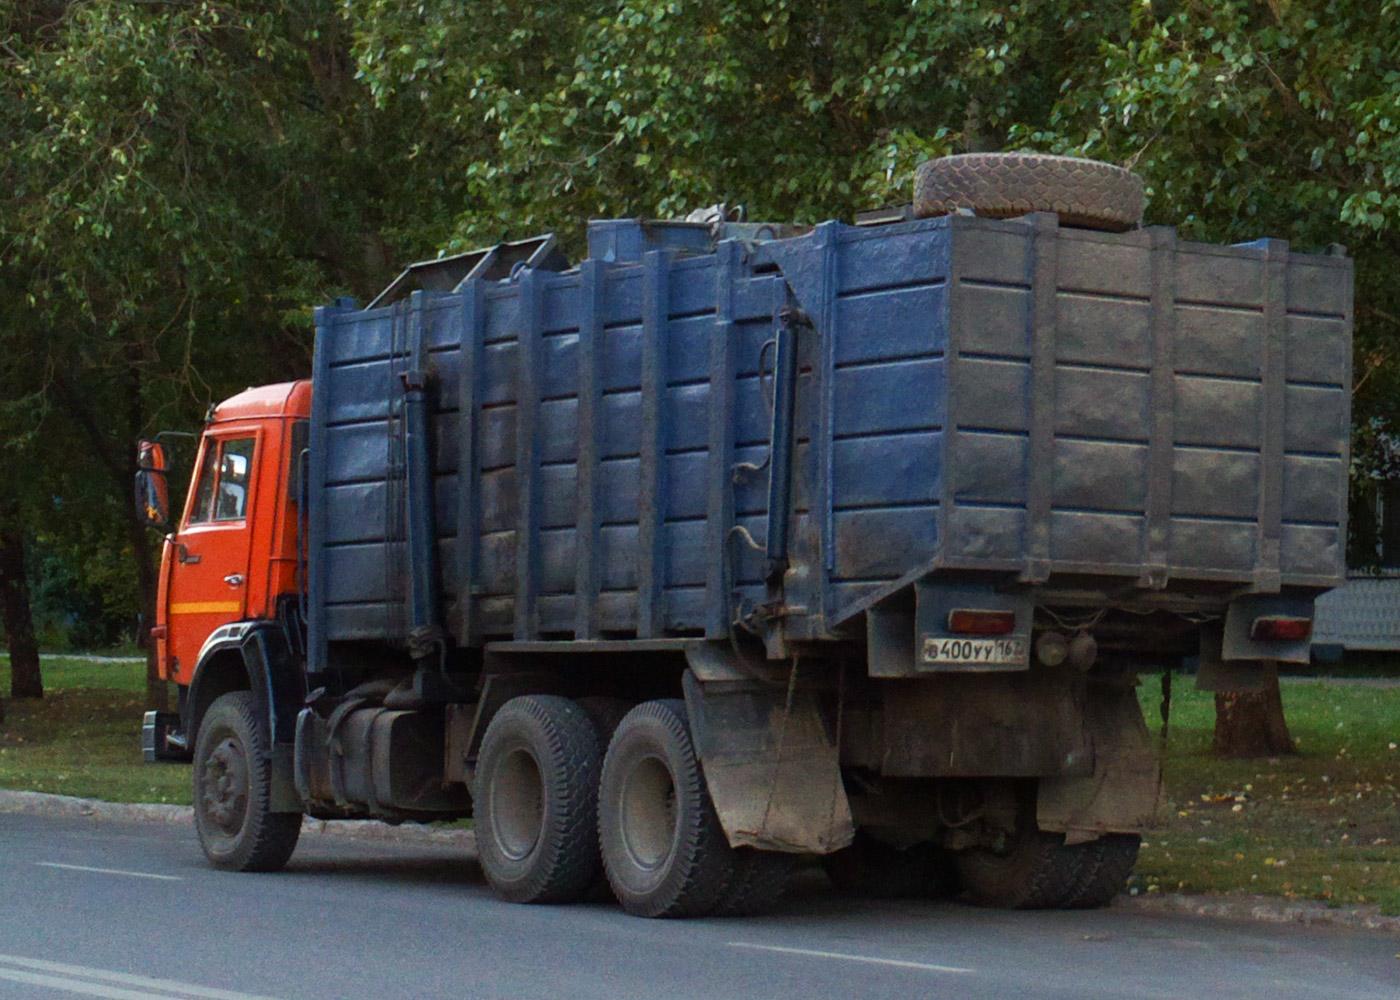 Мусоровоз КО-415А на шасси КамАЗ-53215 #В400УУ163. Самара, улица Тополей